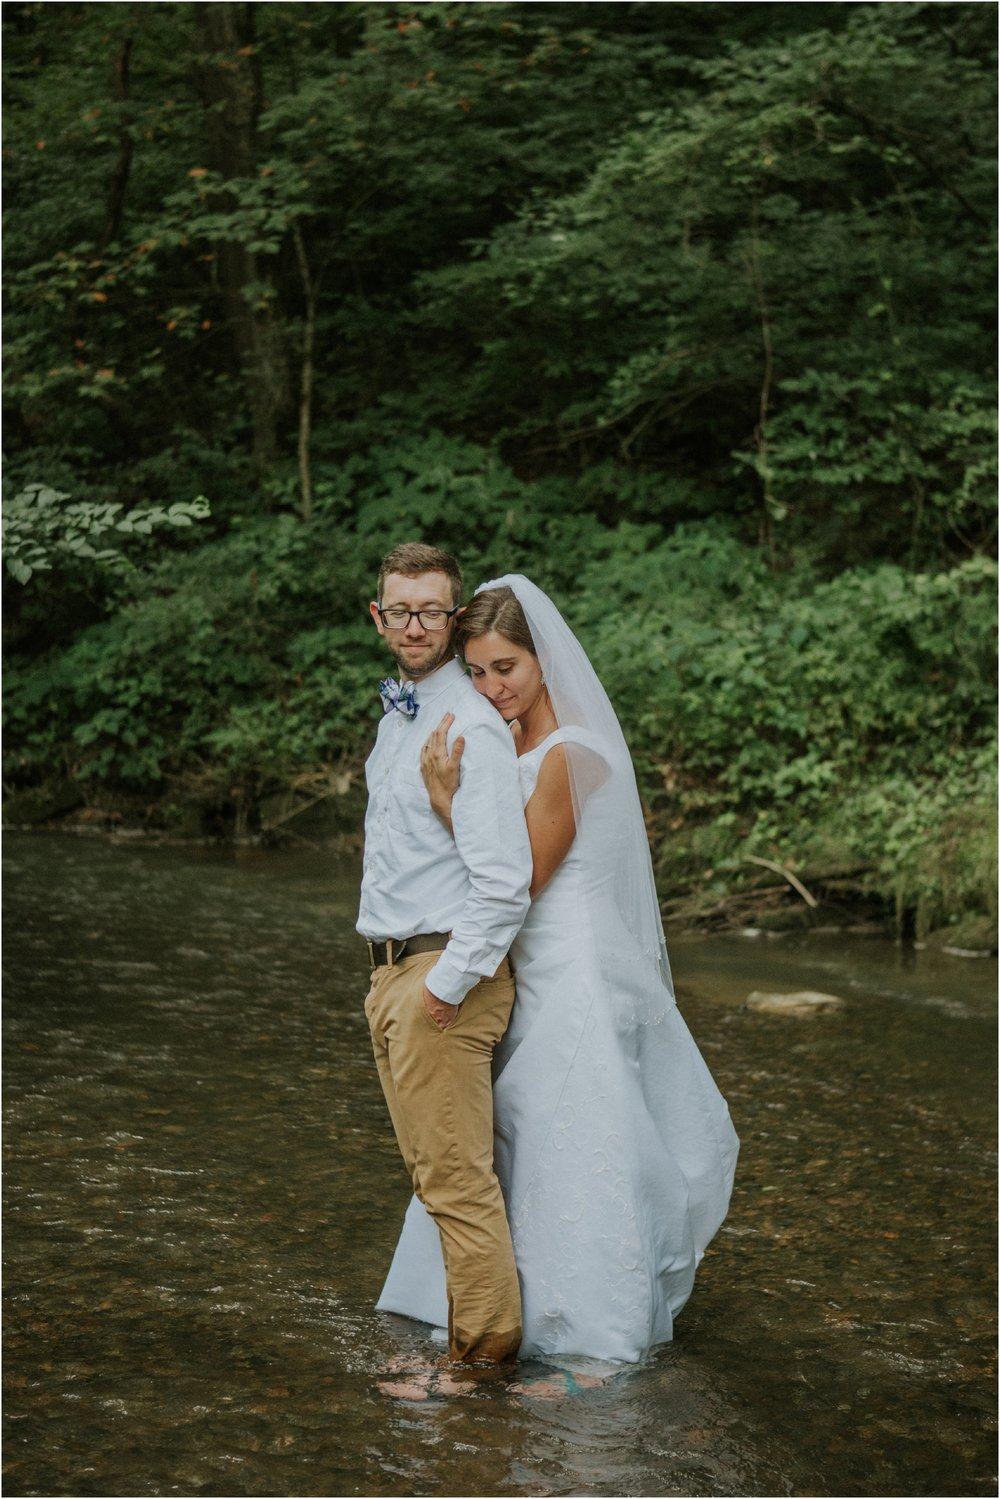 sugar-hollow-park-bristol-virginia-wedding-intimate-woodsy-black-forest-ceremony-adventurous-couple_0084.jpg